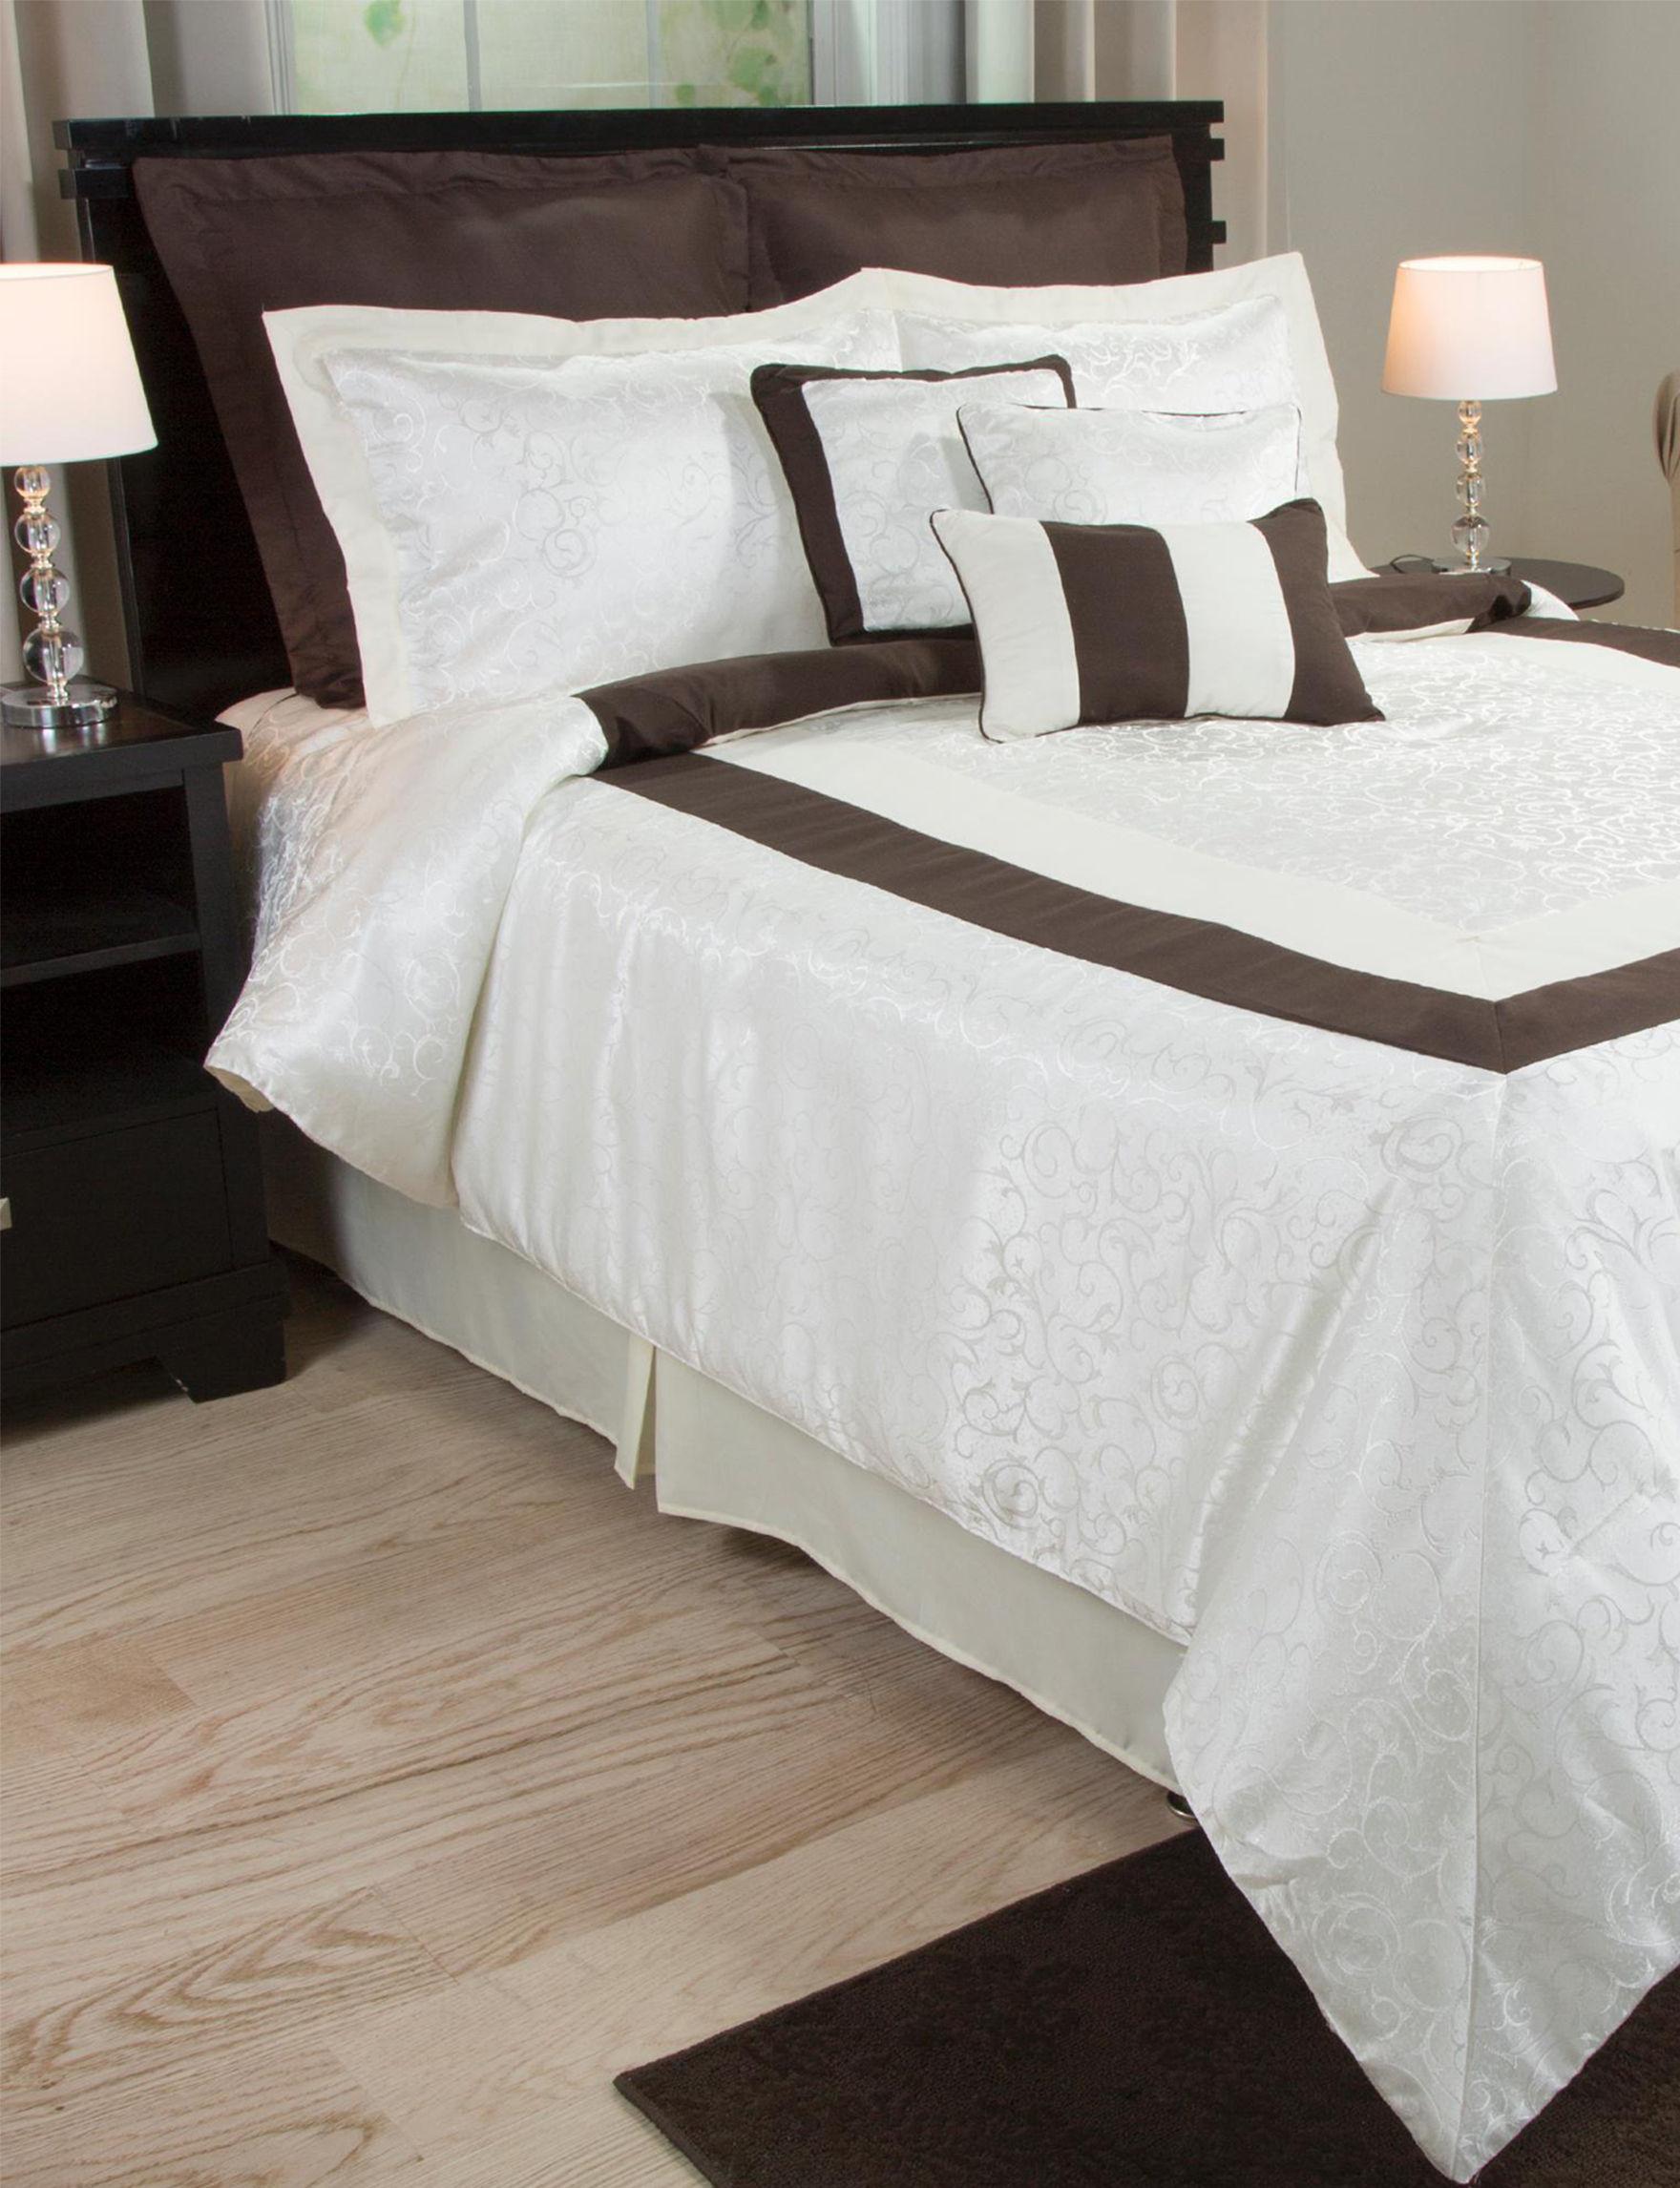 Lavish Home Brown / Ivory Comforters & Comforter Sets